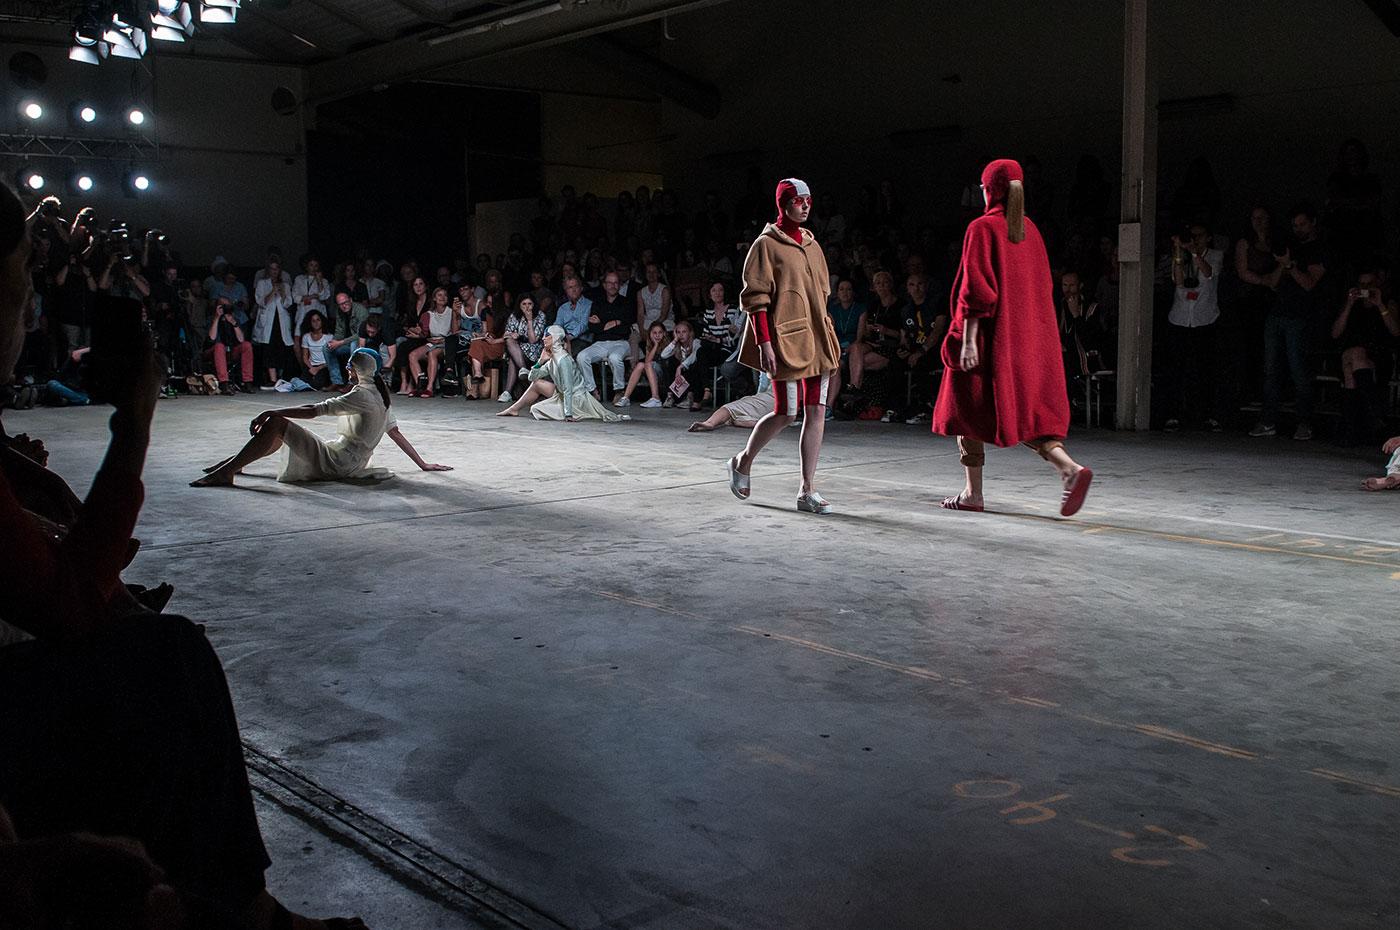 fashionclash festival